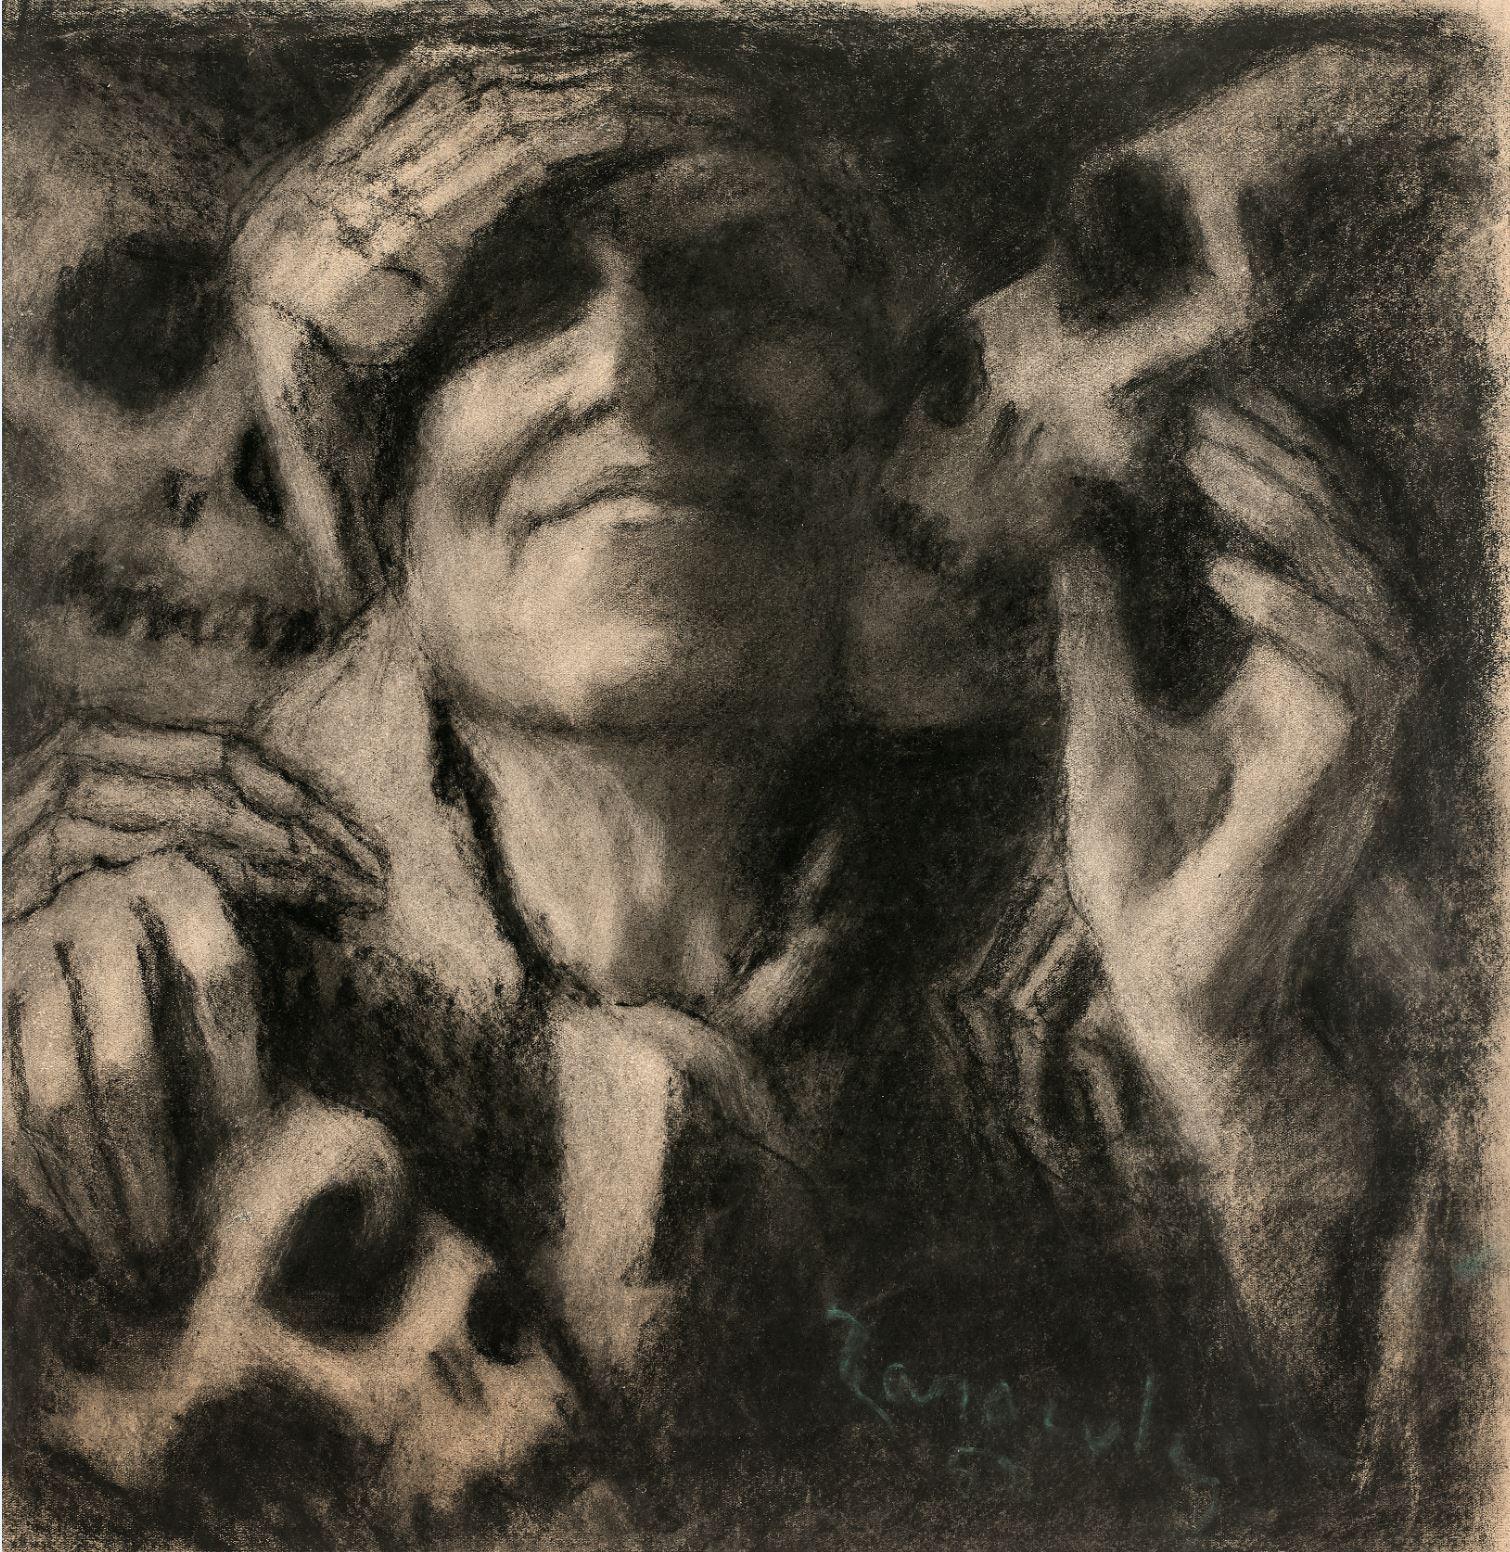 Alban Taracole 1952 Autoportrait Galerie Ambroise Duchemin